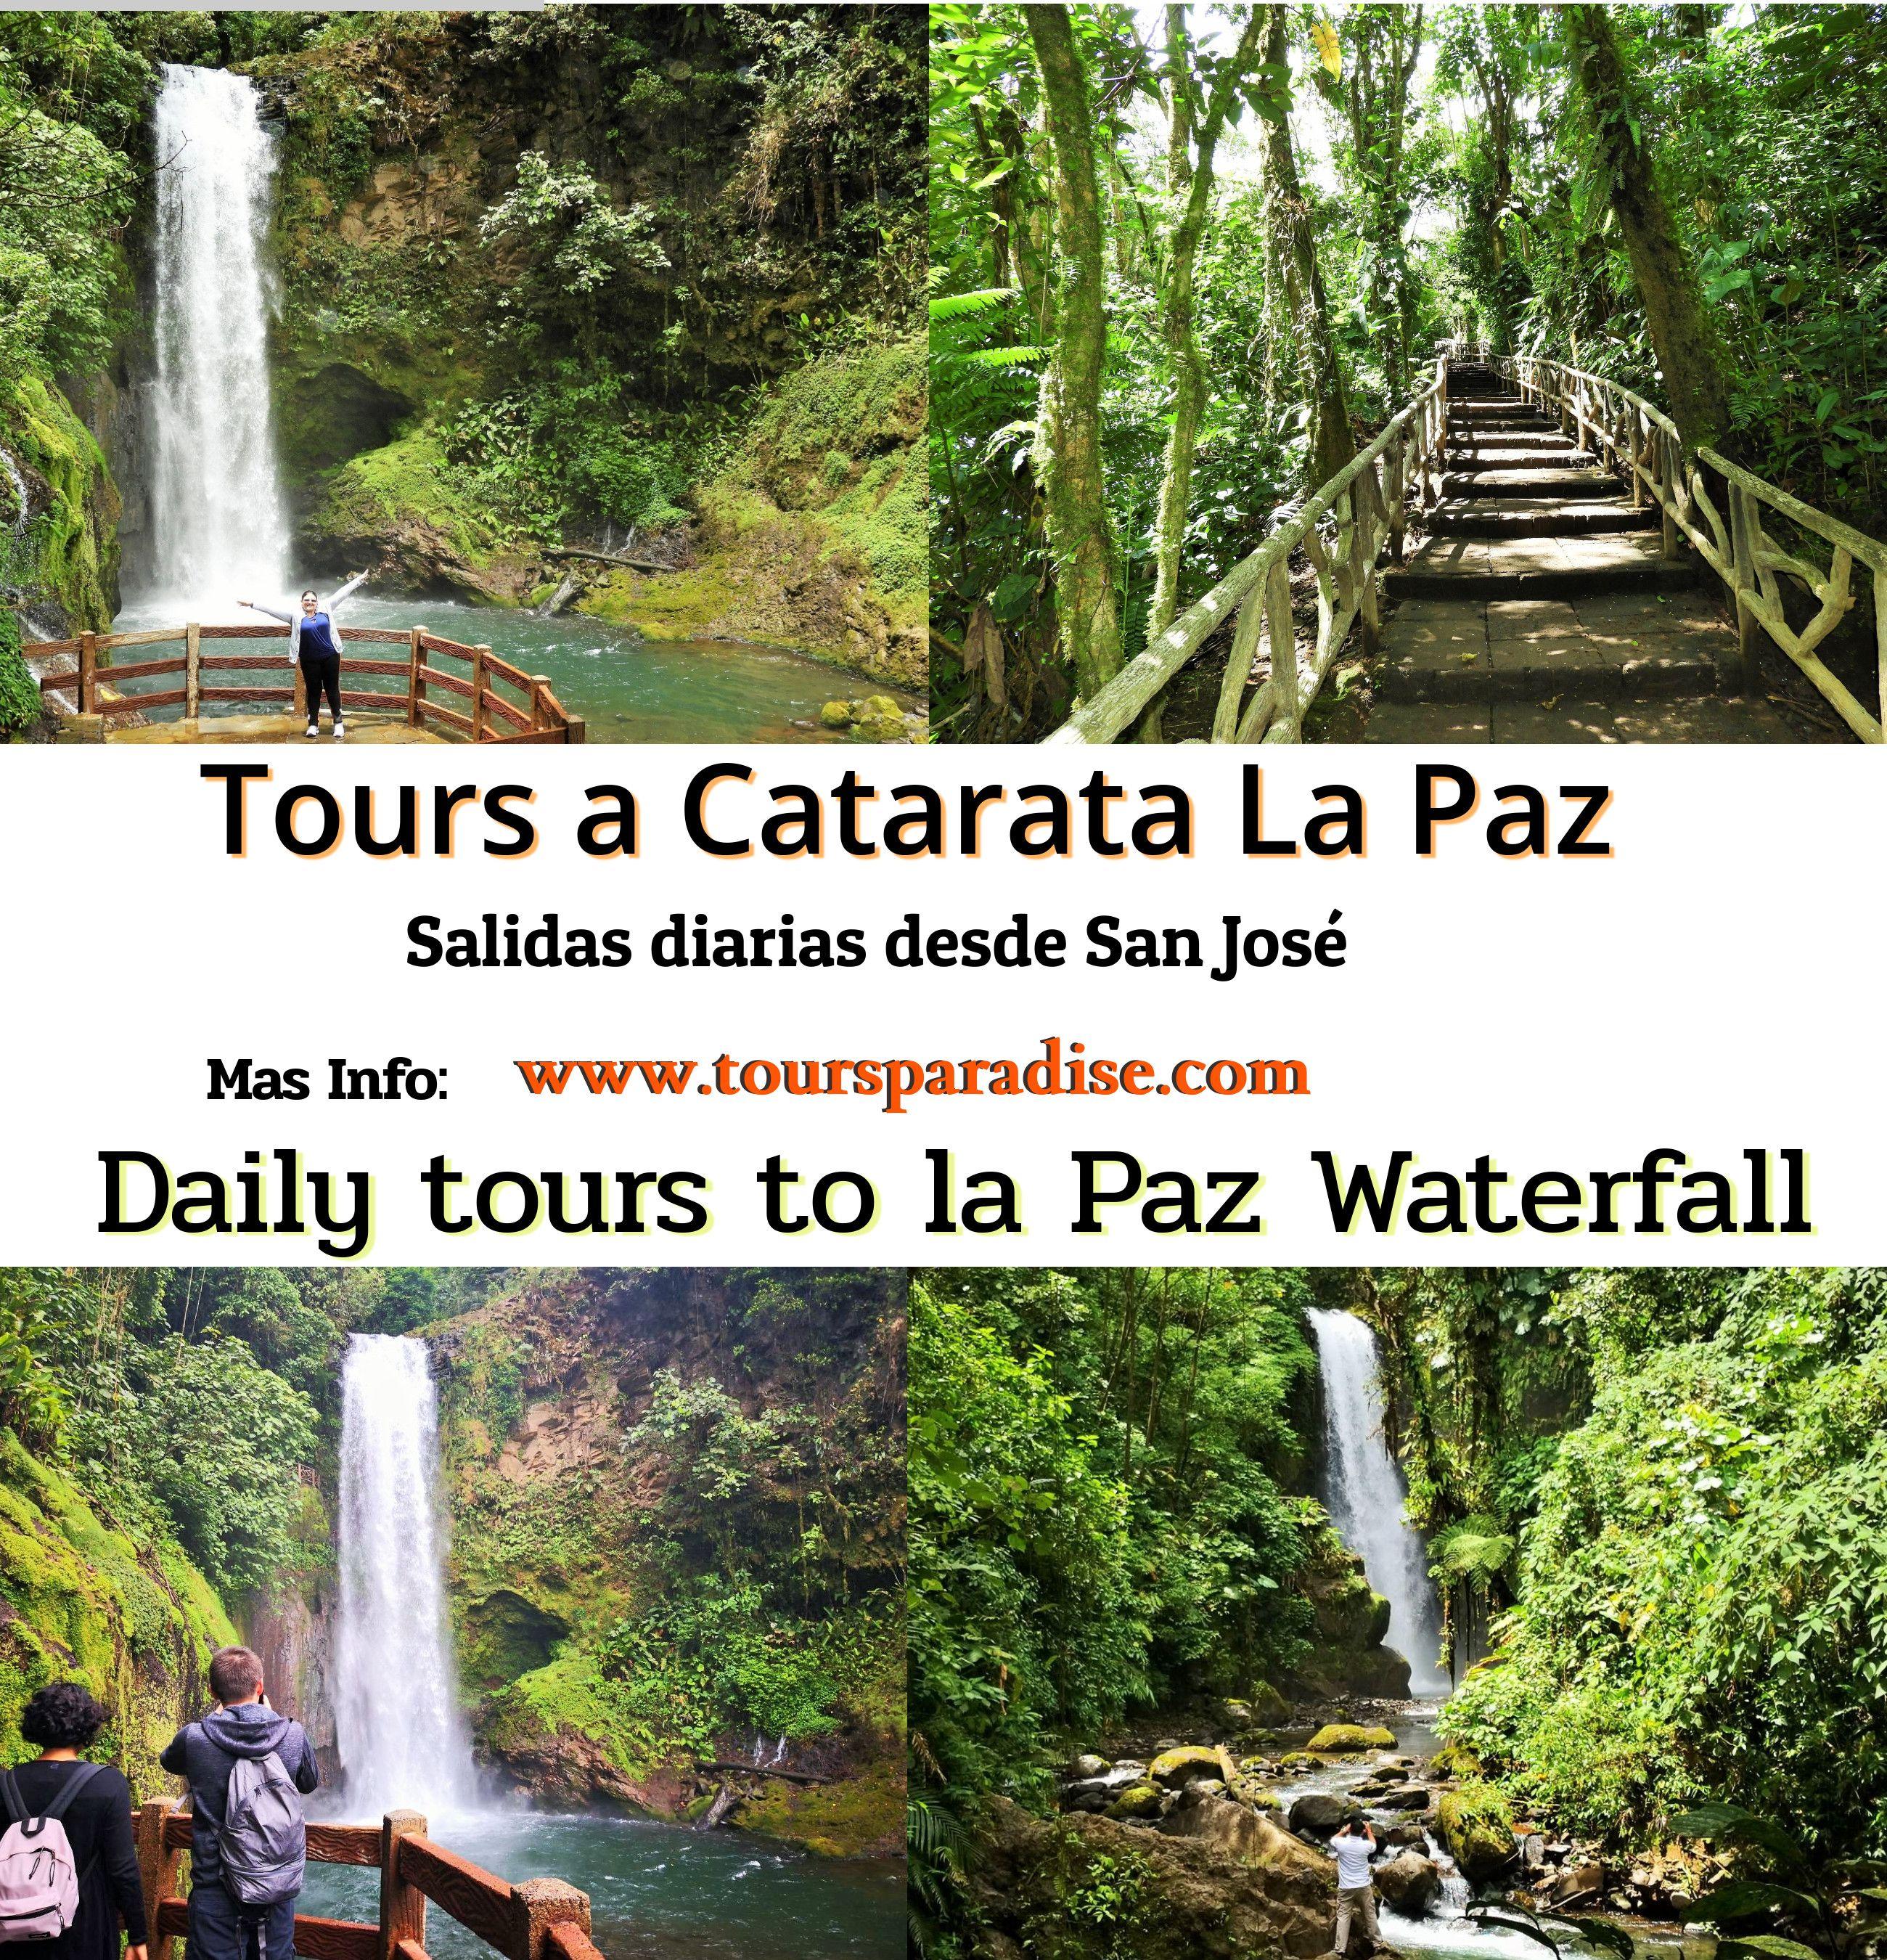 b4959b3892a744a030be2da9b808fca5 - La Paz Waterfall Gardens Tour From San Jose